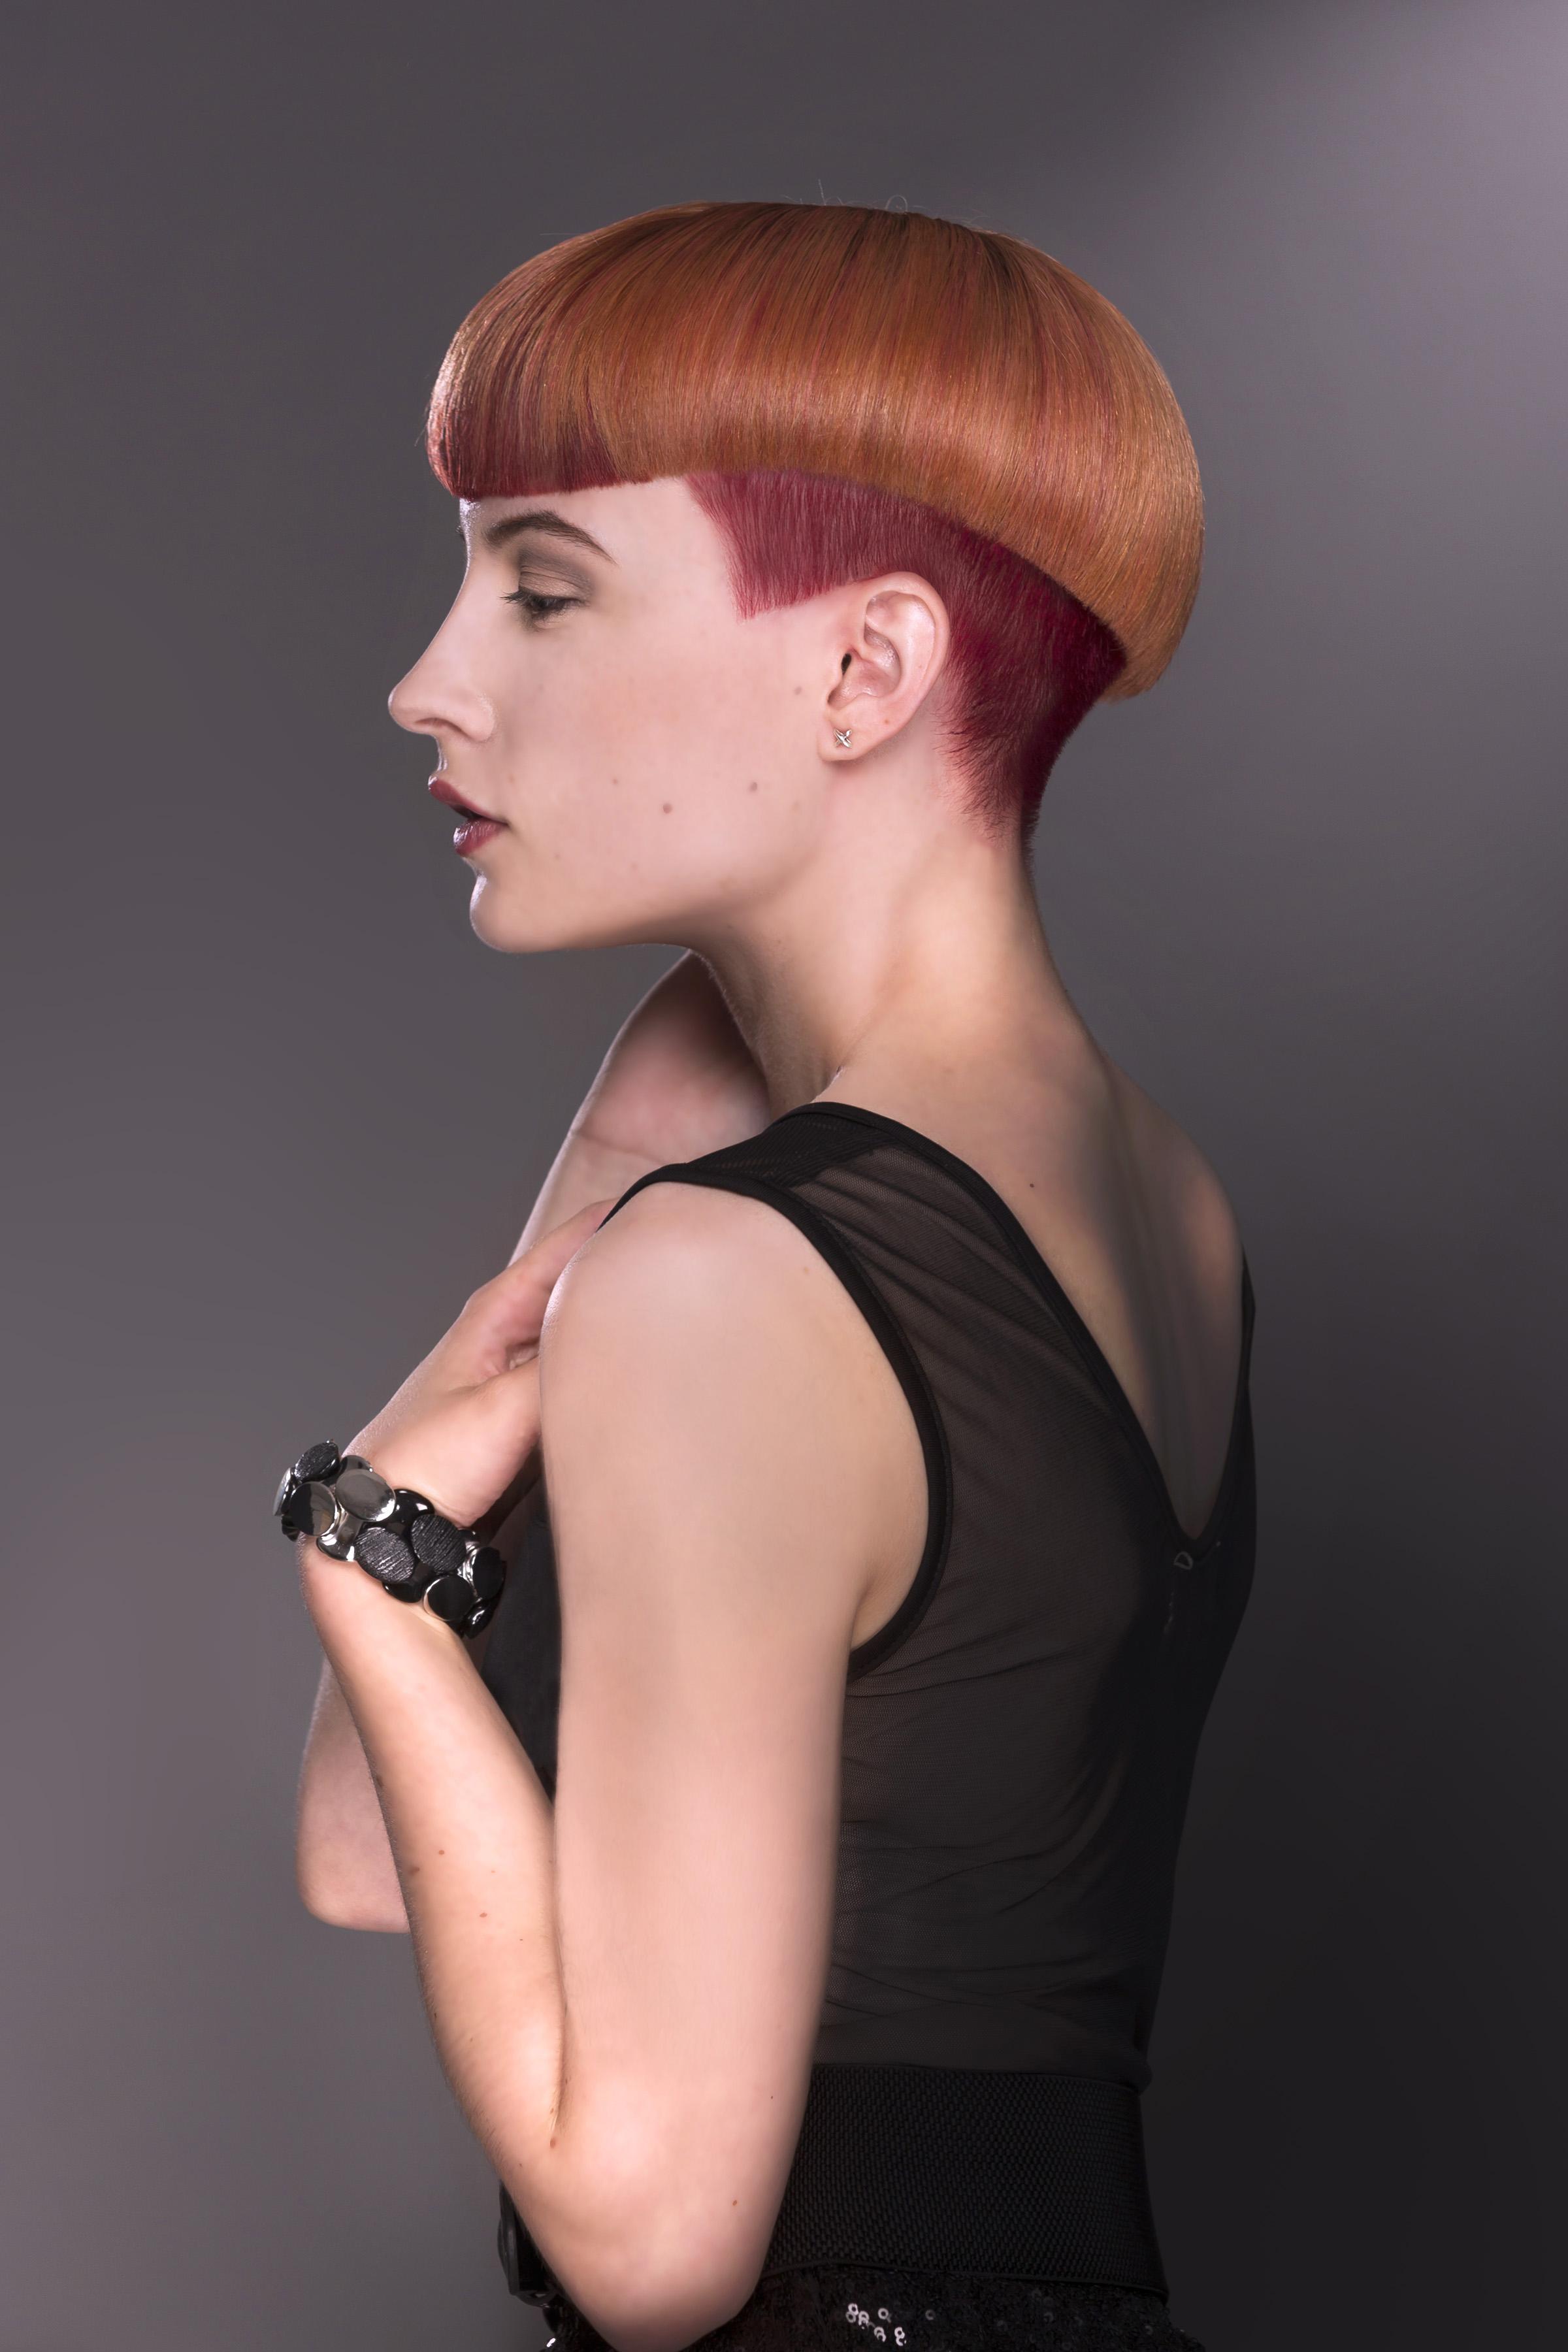 beauty+stylist+2013+portrait+side+copy